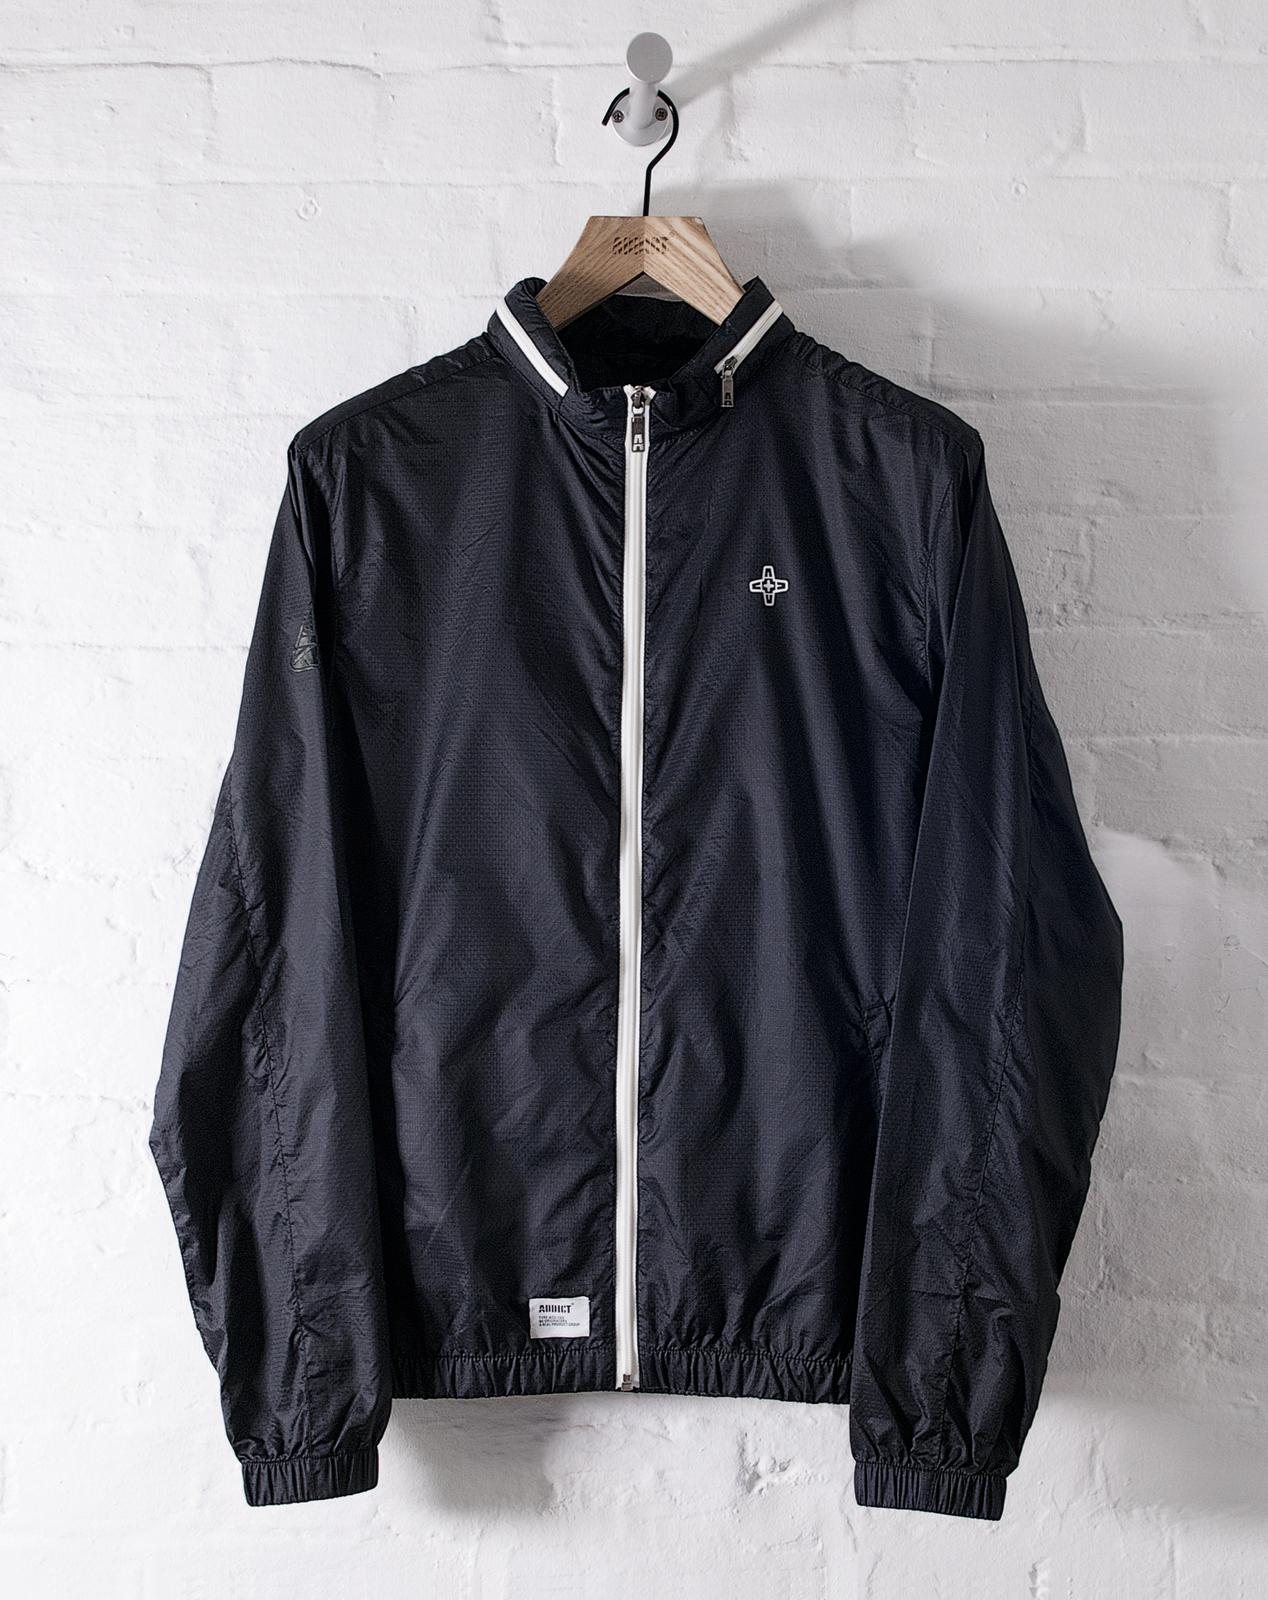 Addict Mens Awayday Zip Jacket Lightweight 100 Nylon